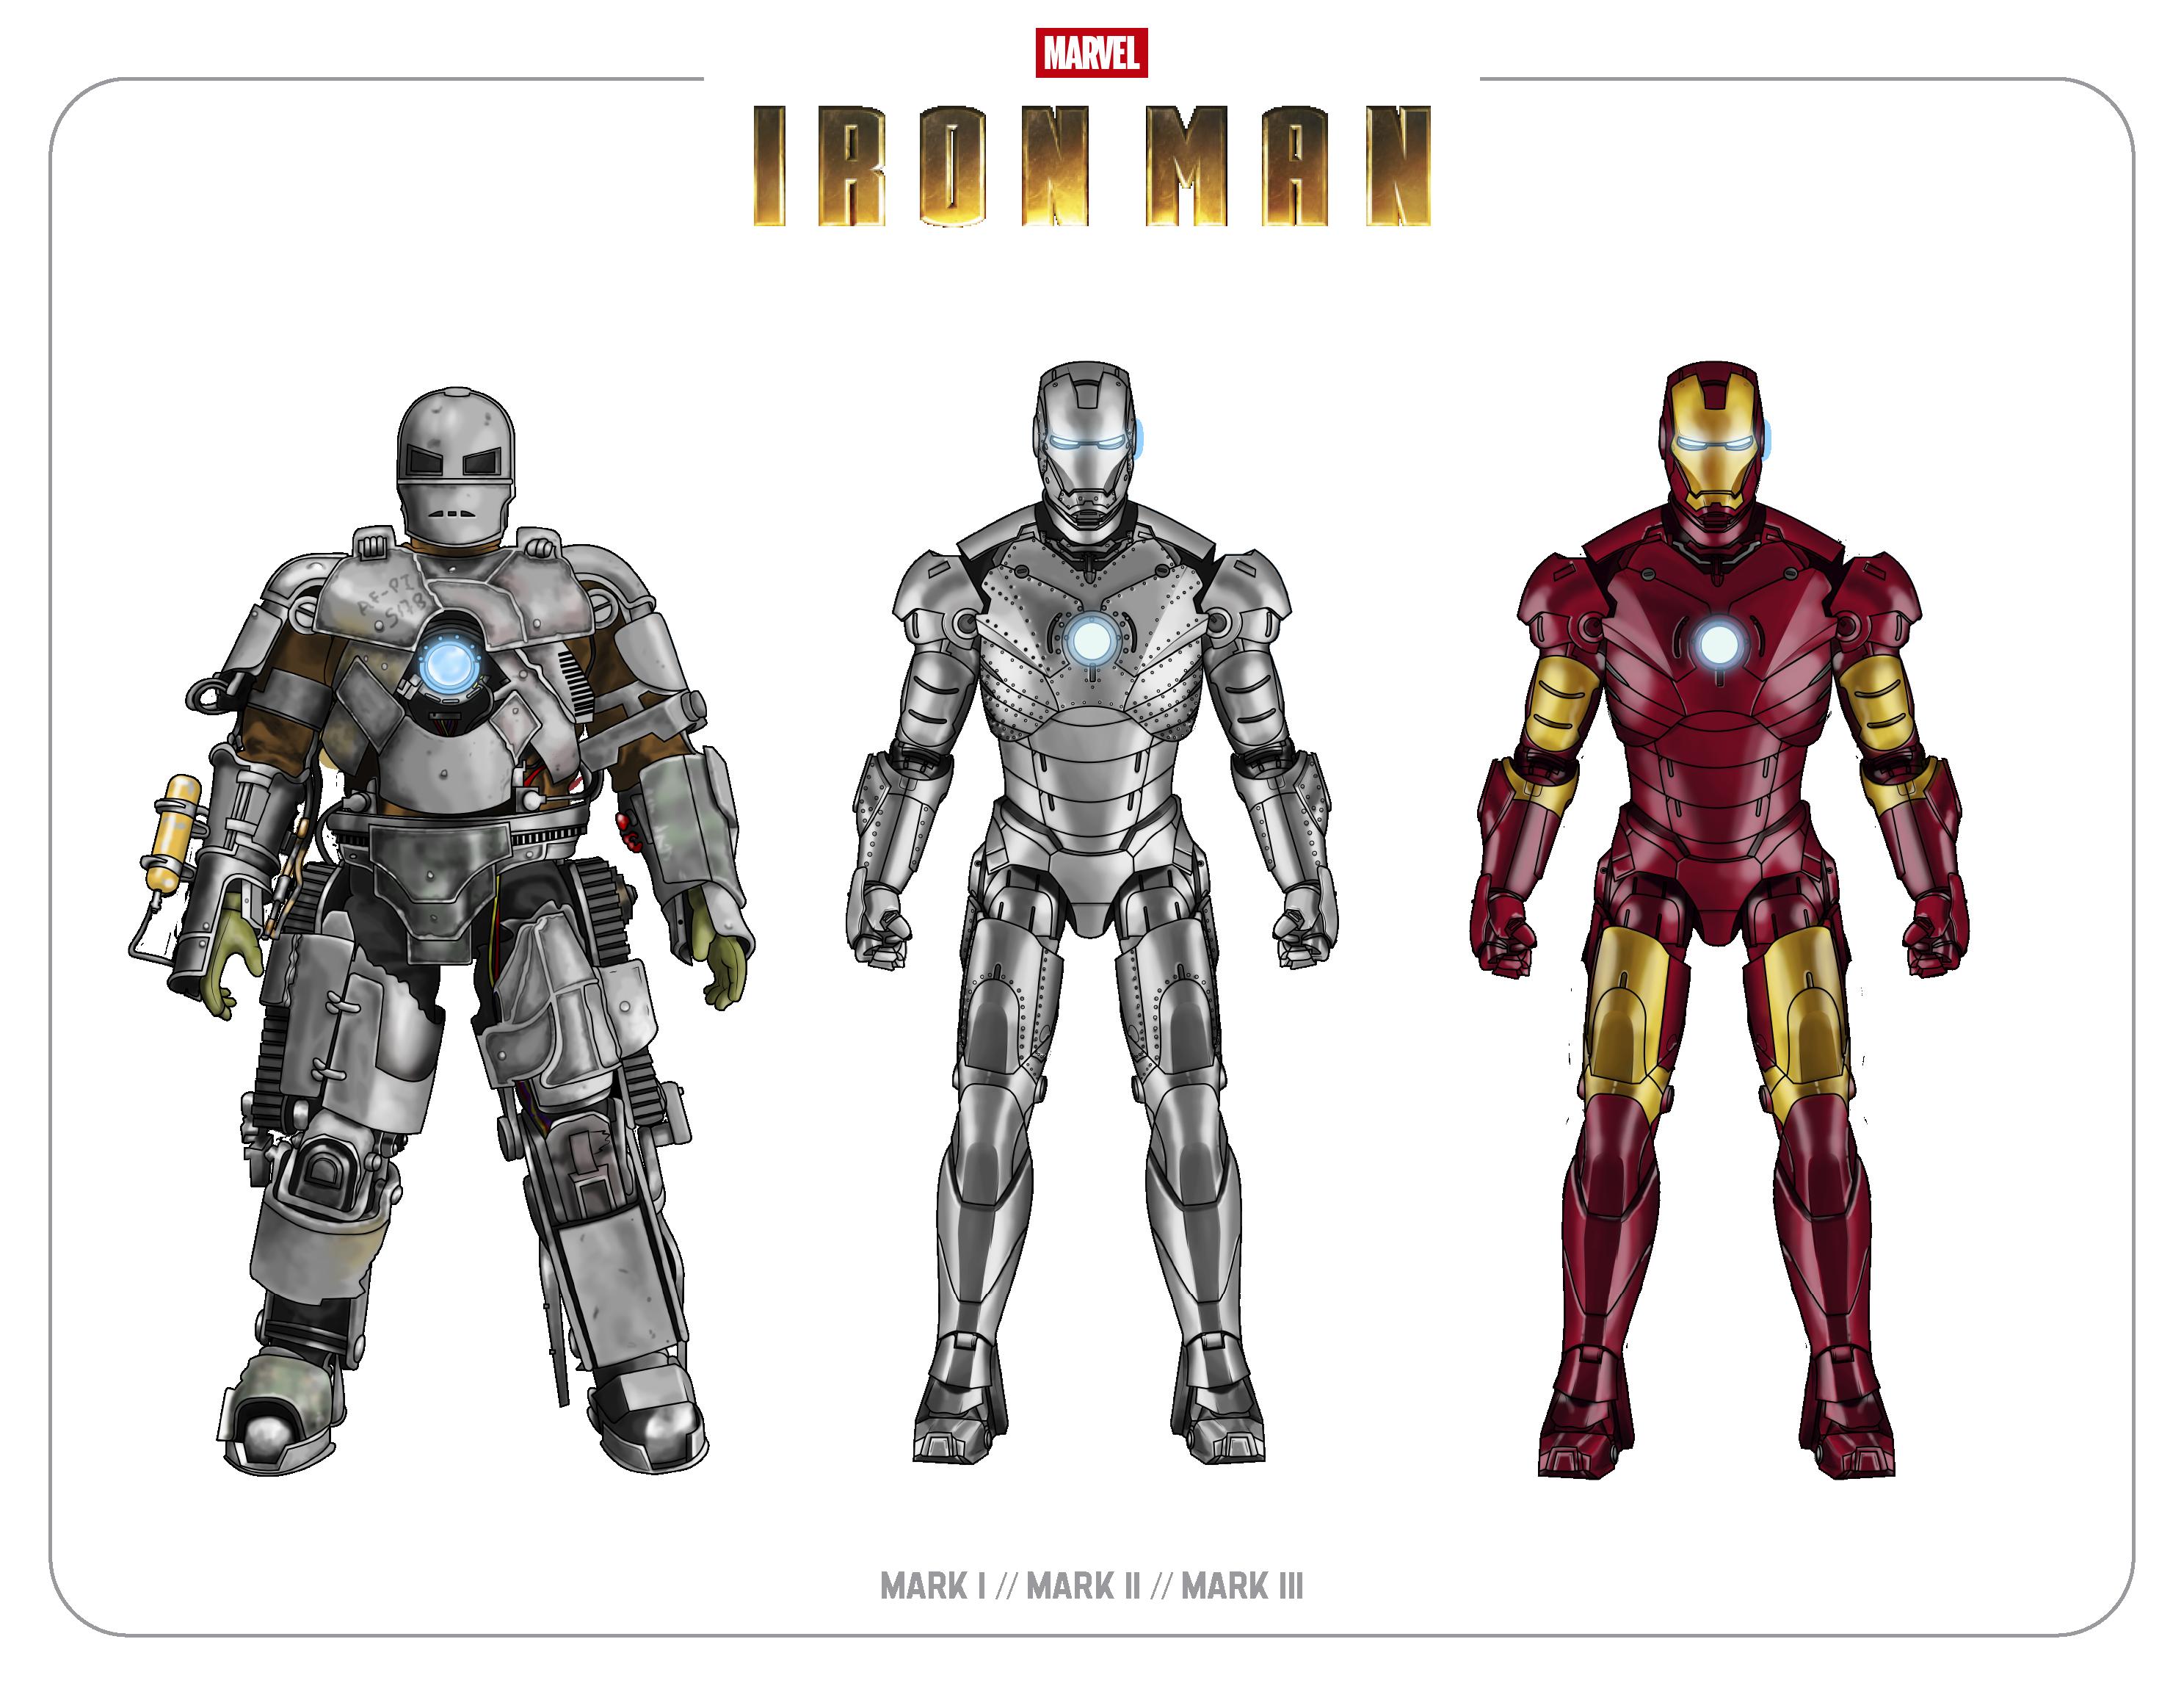 Iron Man 2008 By Efrajoey1 On Deviantart